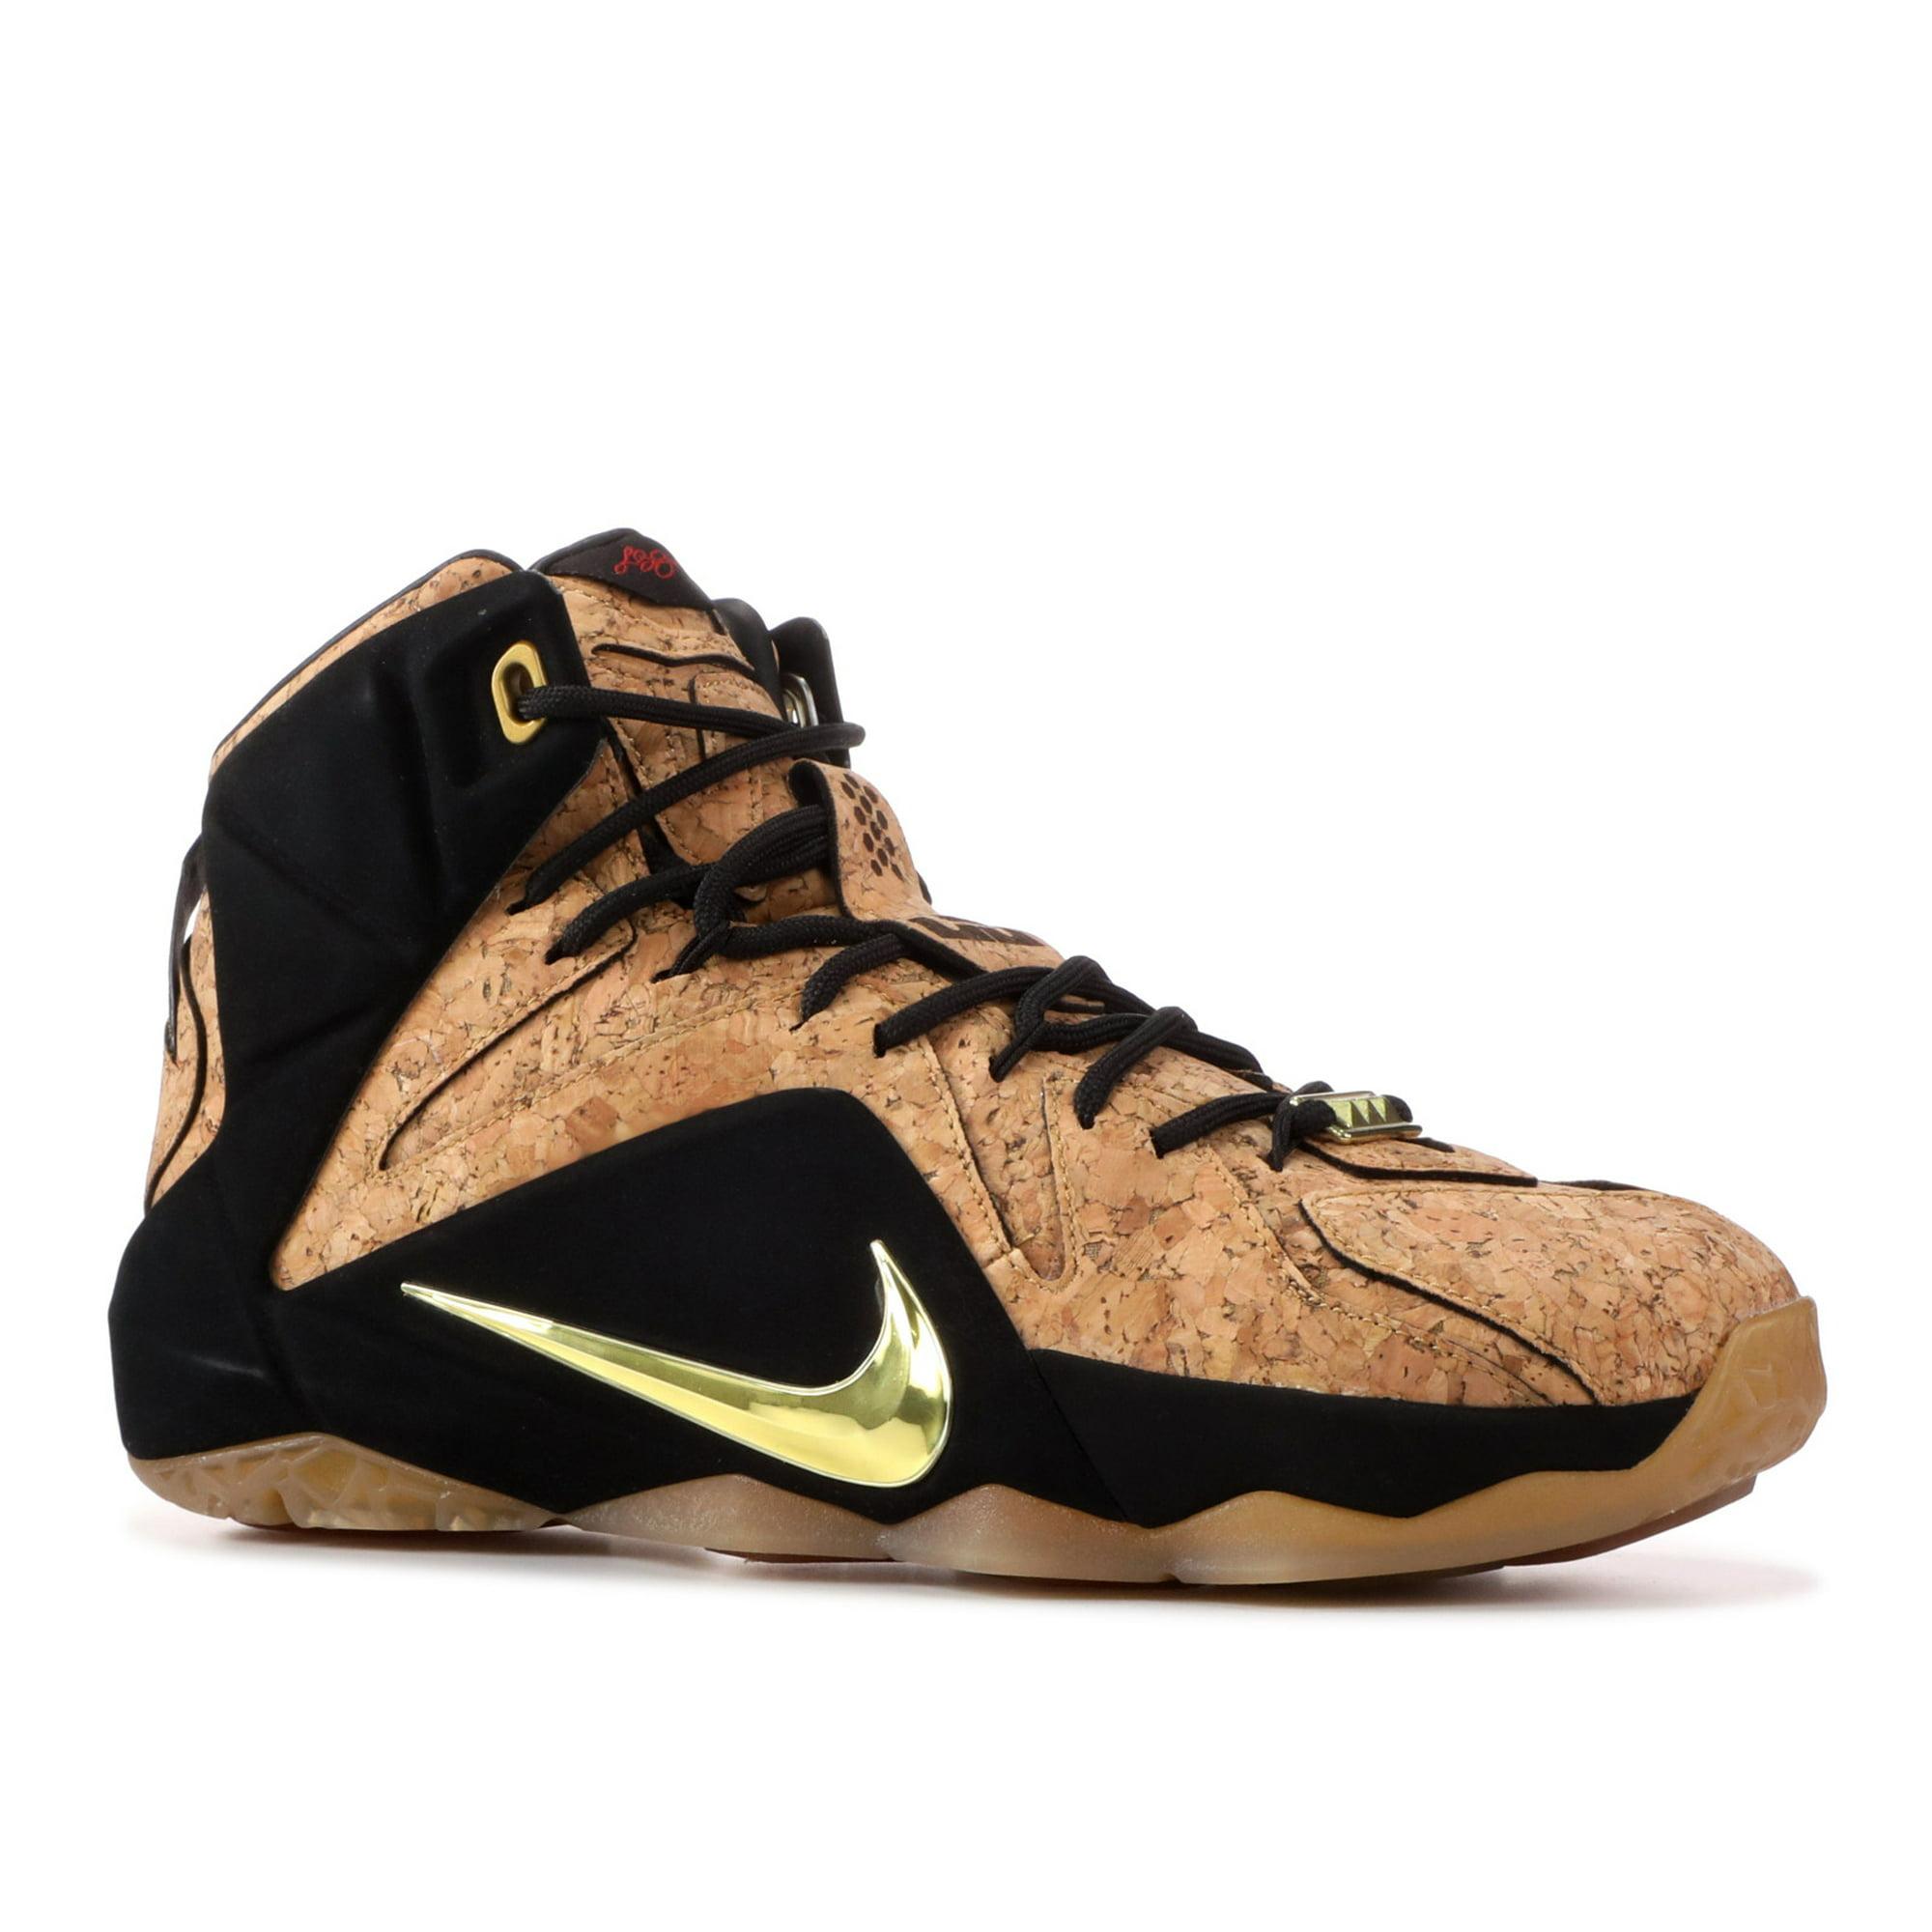 fb3774370bc Nike - Men - Lebron 12 Ext  King s Cork  - 768829-100 - Size 8 ...